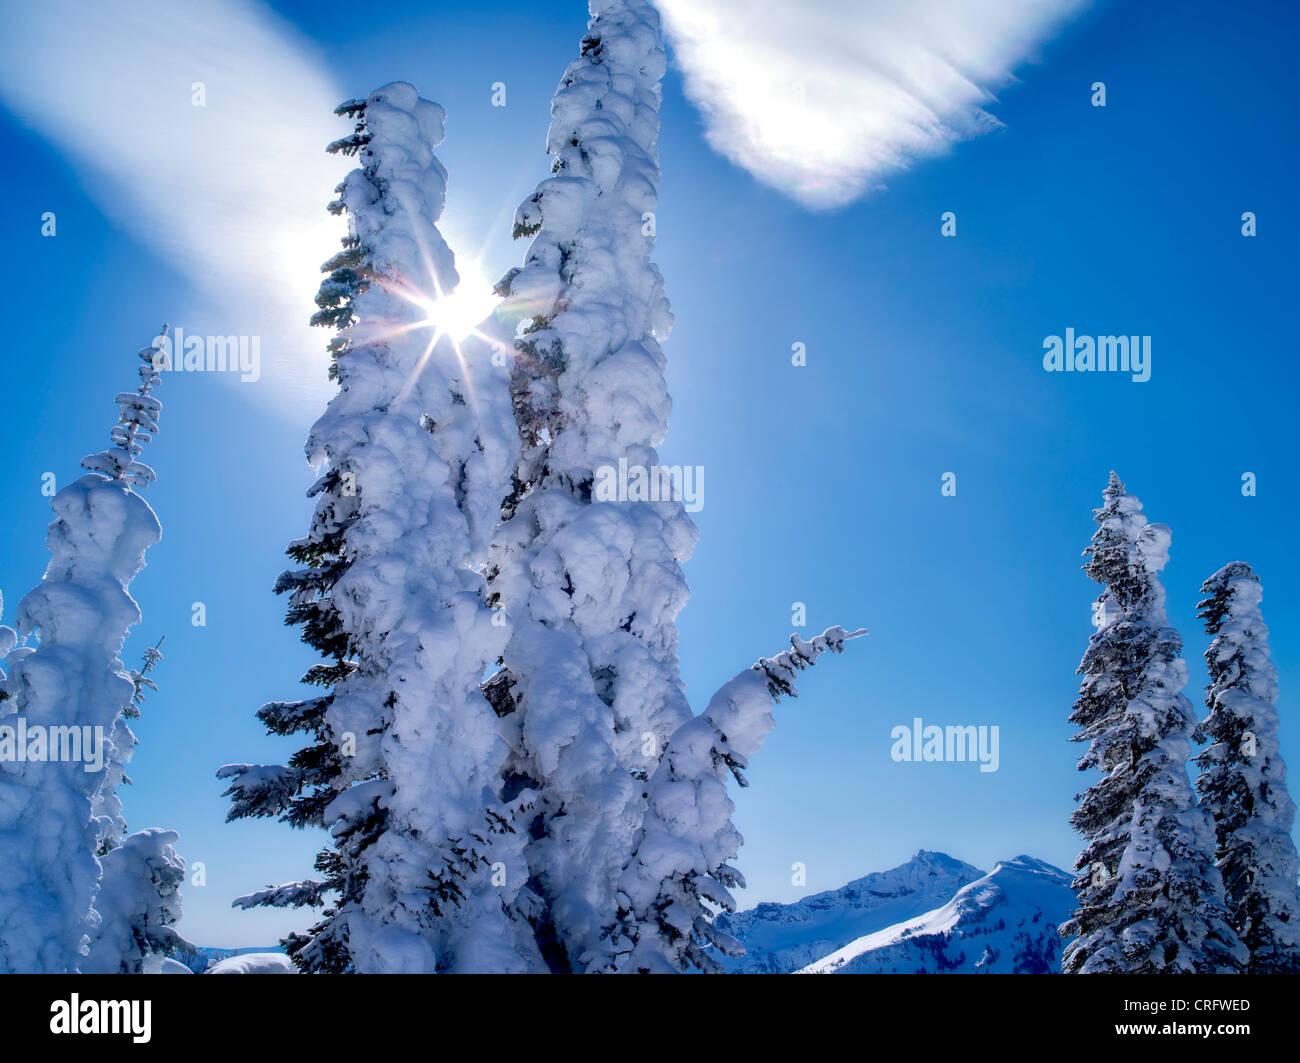 Coperta di neve alberi con sunburst e cloud. Mt. Rainier National Park, Washington Immagini Stock